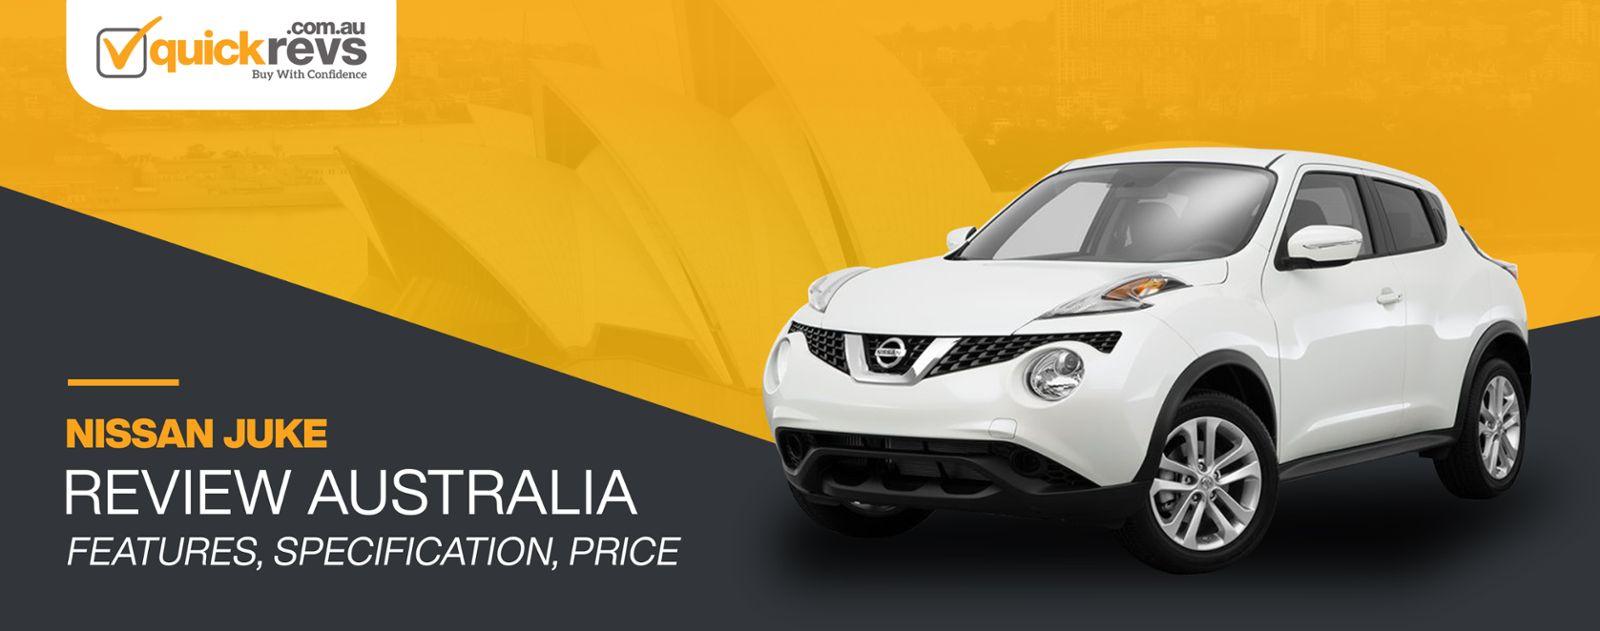 Nissan Juke Review Australia